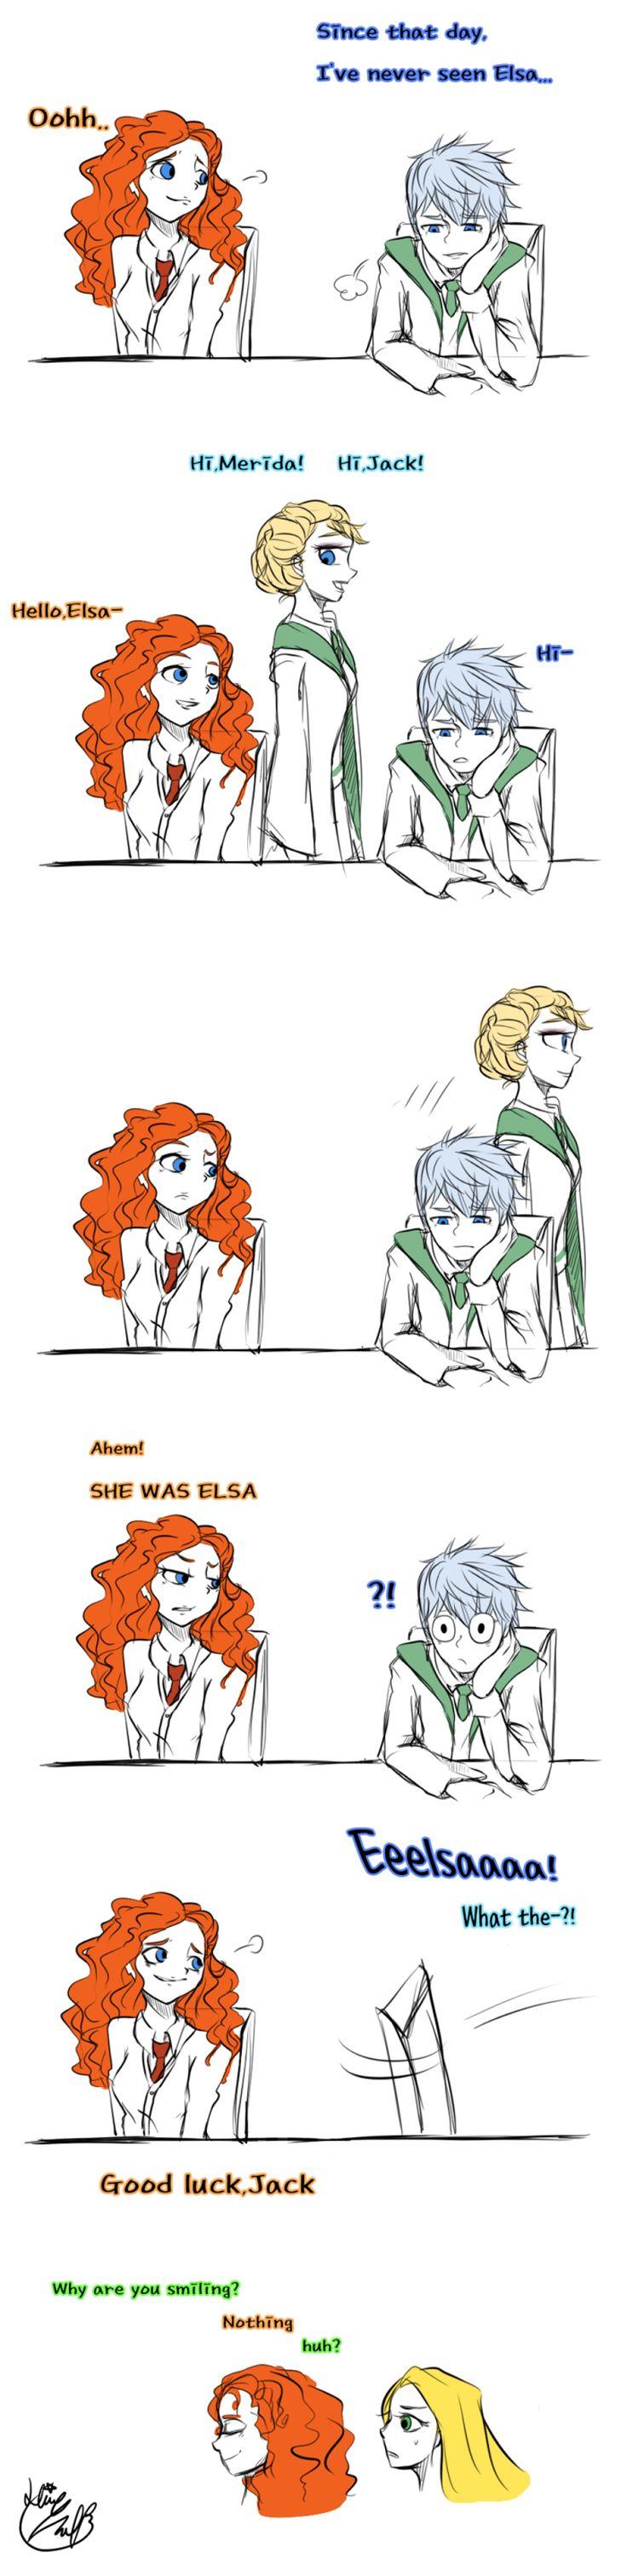 jelsa: jack frost: rapunzel: merida: the big four: elsa: Good luck,buddy (doodles) by Lime-Hael.deviantart.com on @deviantART